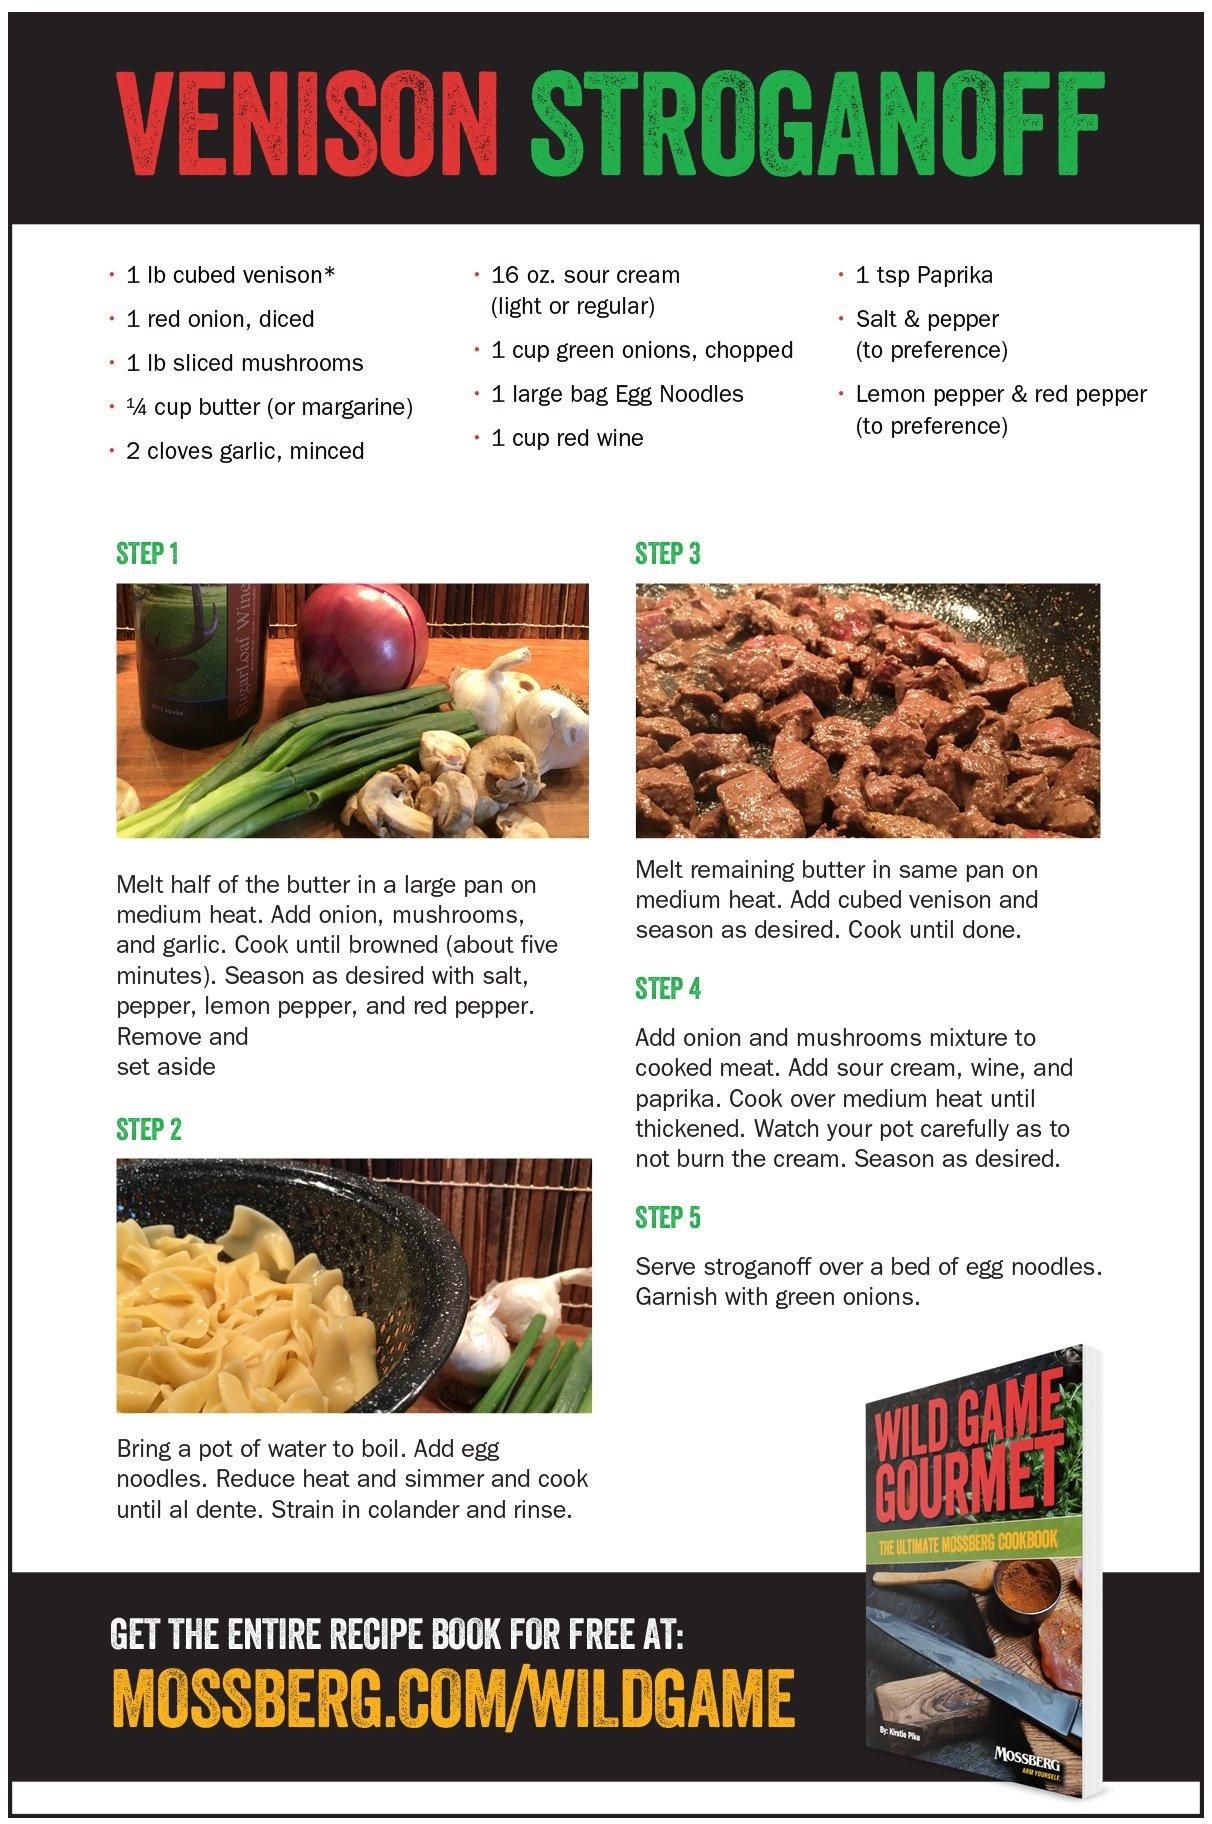 MOSS18005 Wild Game Gourmet-Recipe Card-f-2